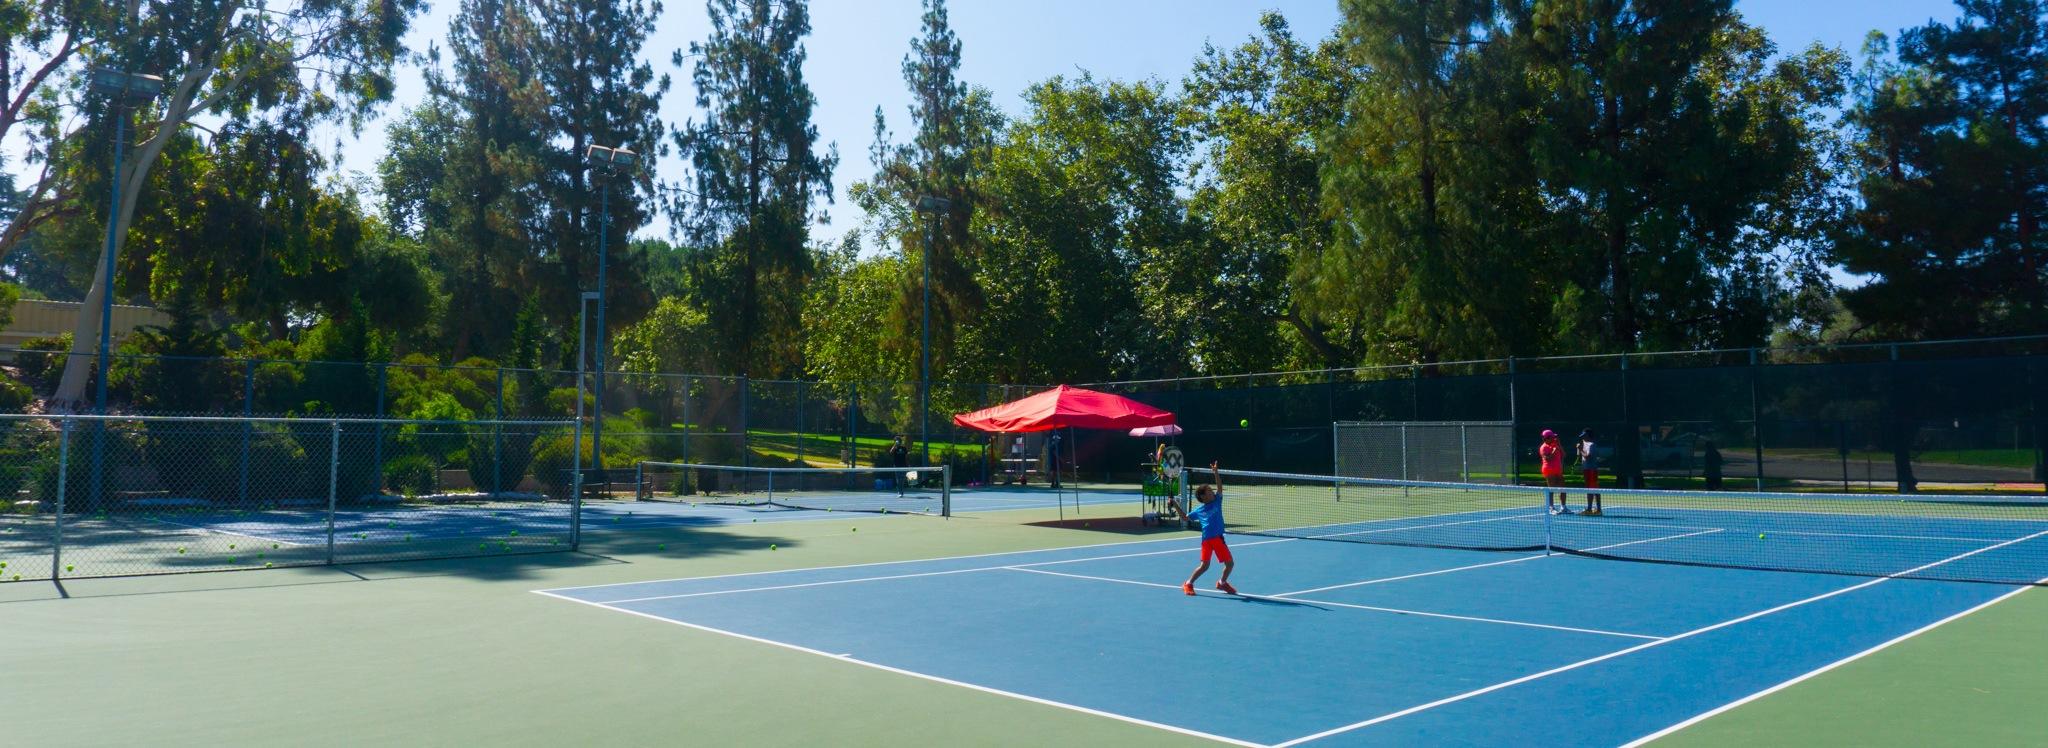 beautiful tennis courts Loma Alta Park Altadena California